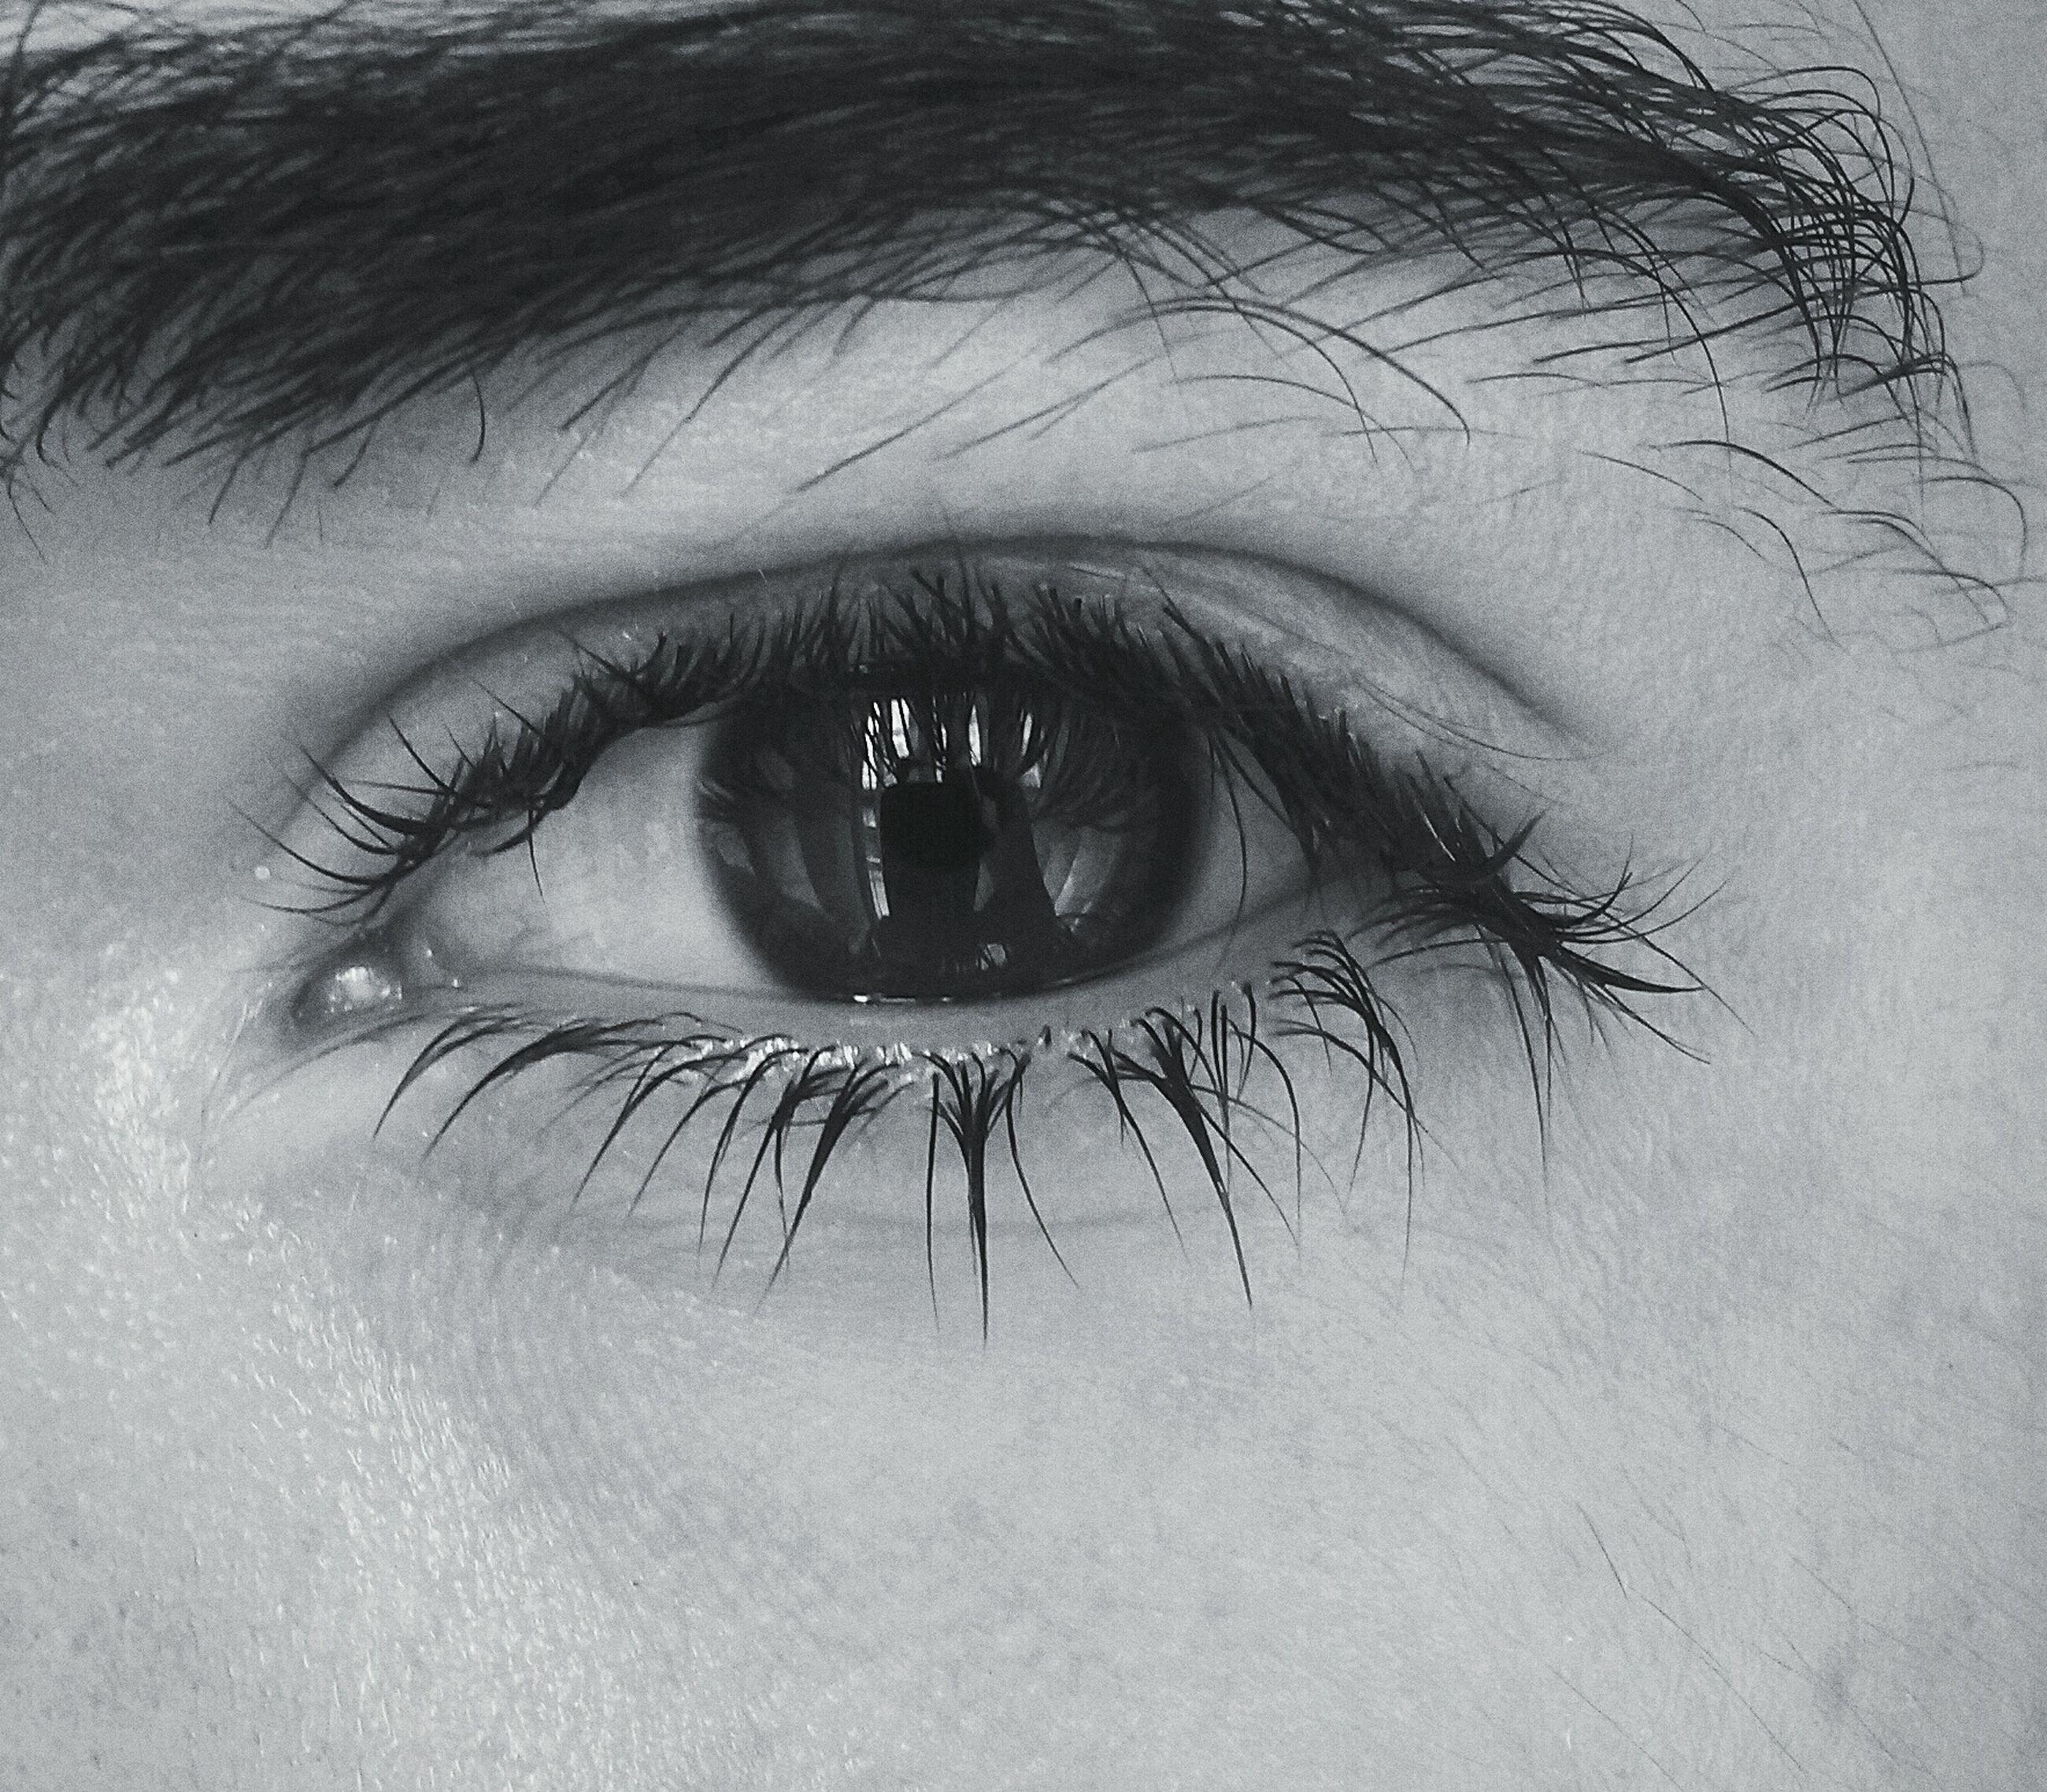 human eye, eyelash, close-up, looking at camera, eyesight, portrait, sensory perception, part of, extreme close-up, lifestyles, human skin, eyeball, human face, indoors, iris - eye, person, extreme close up